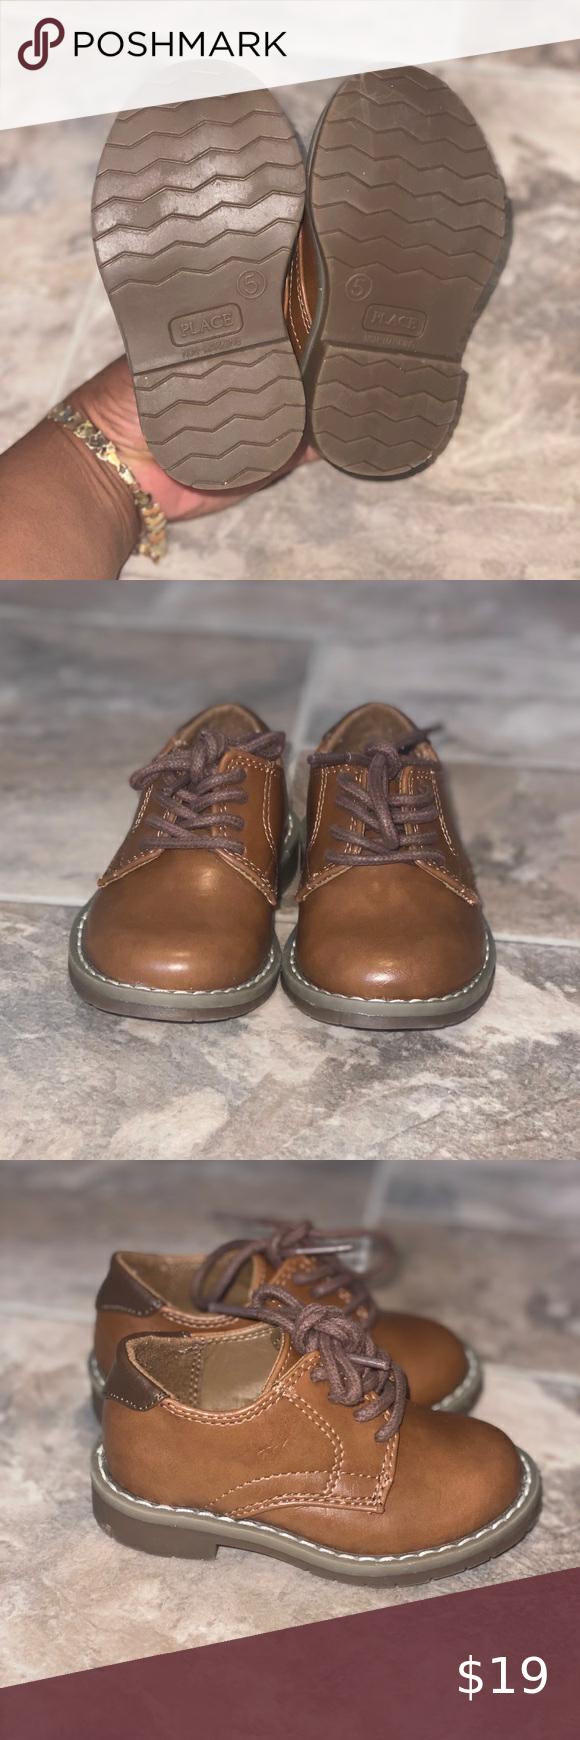 Little boy dress shoes Baby boy size 5